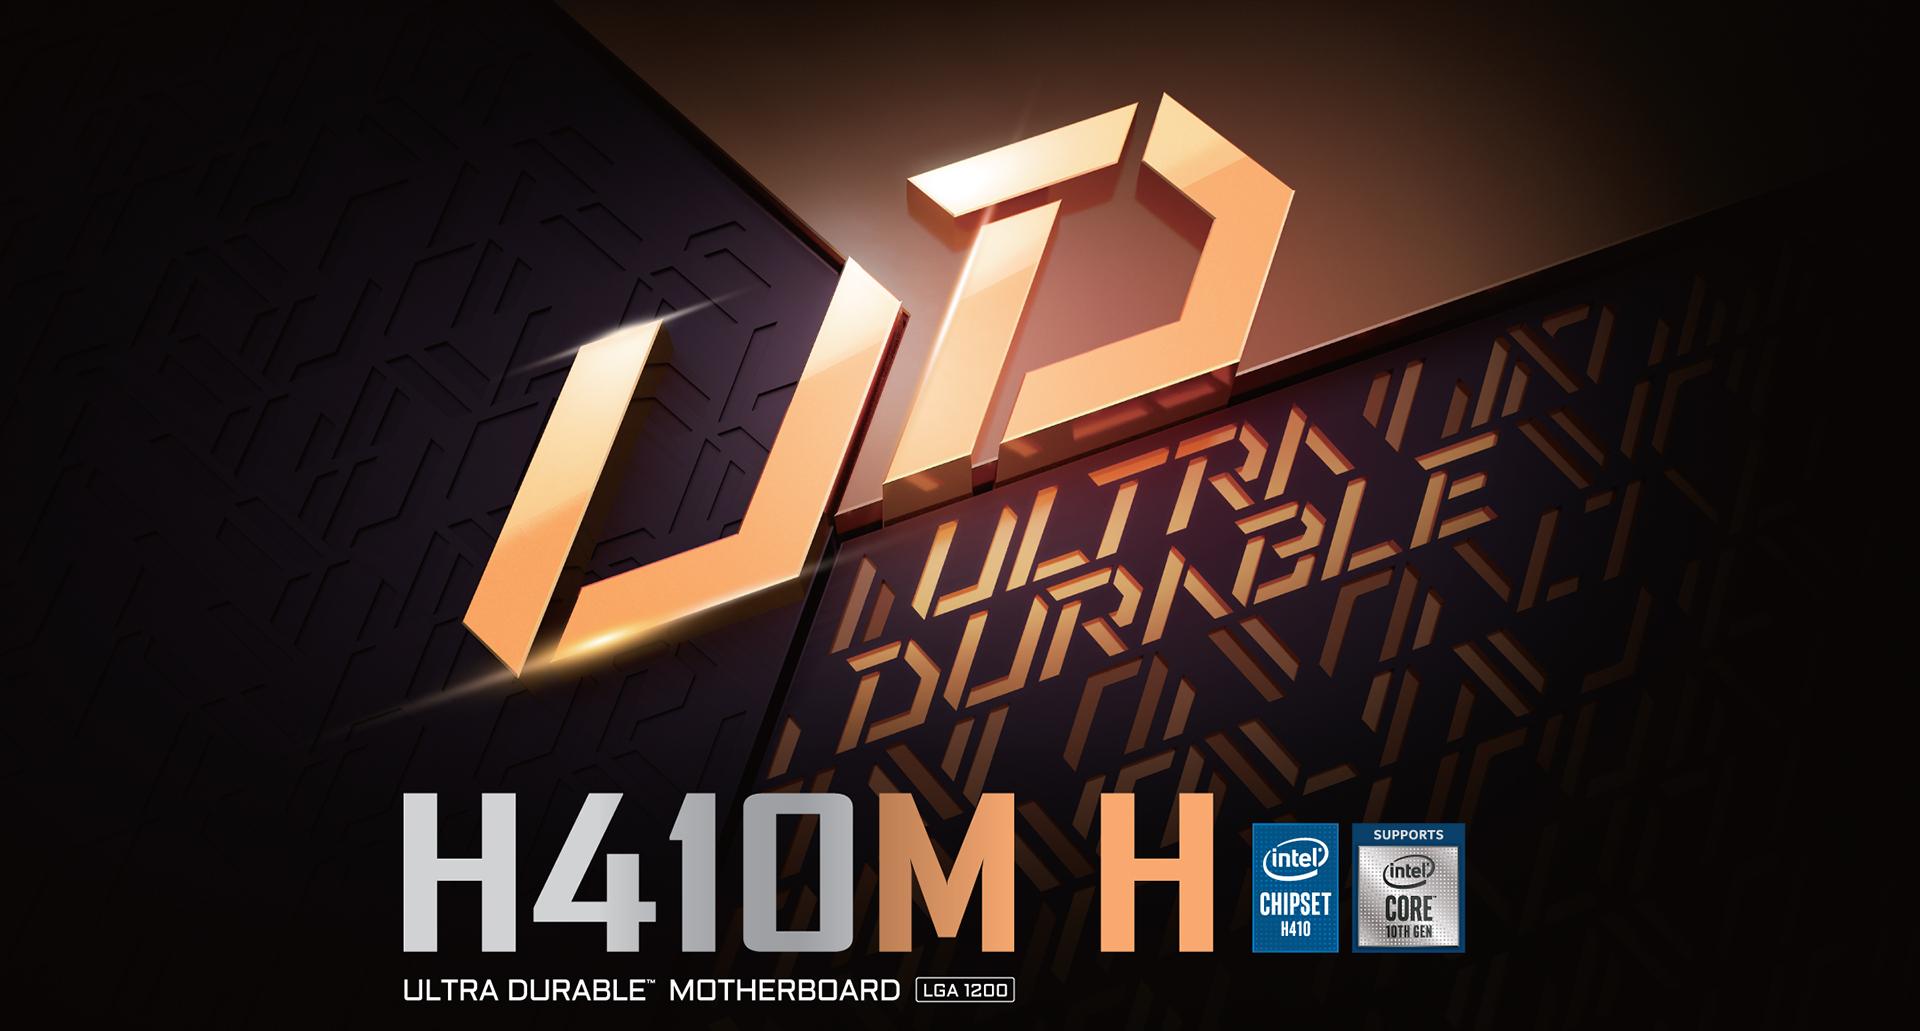 H410M H (rev. 1.0) Key Features | Motherboard - GIGABYTE Global